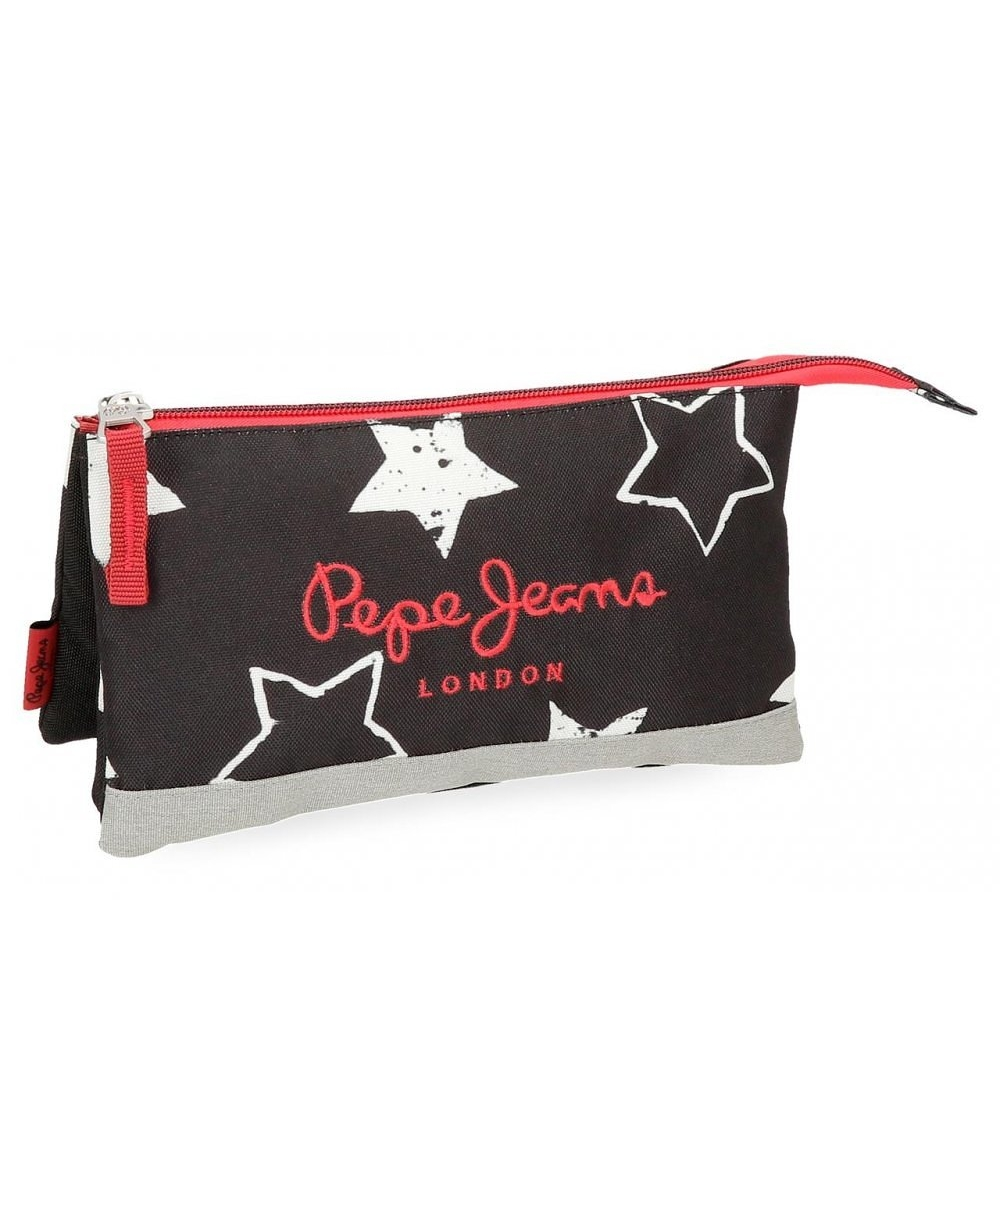 Pepe Jeans Jessa Estuche Negro (Foto )